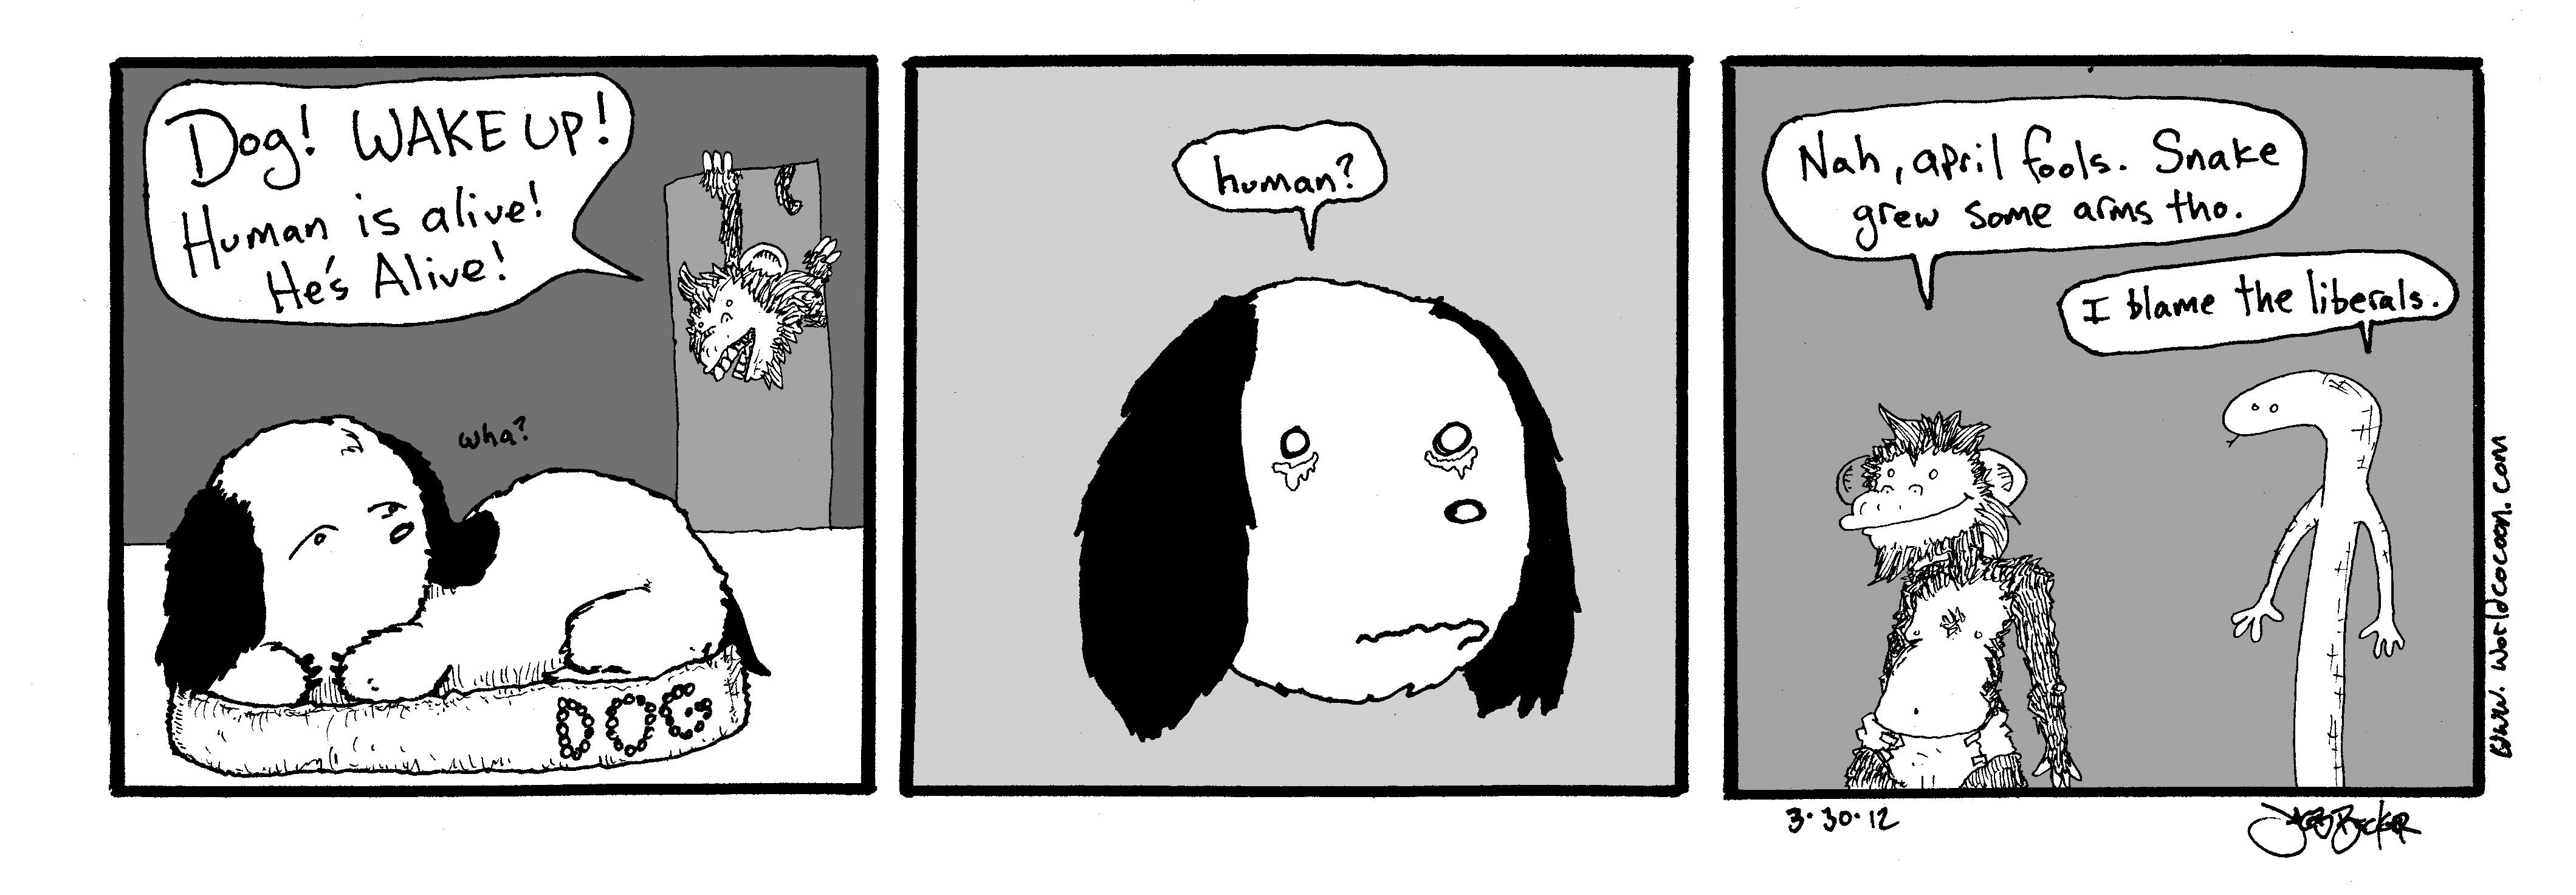 03/30/2012